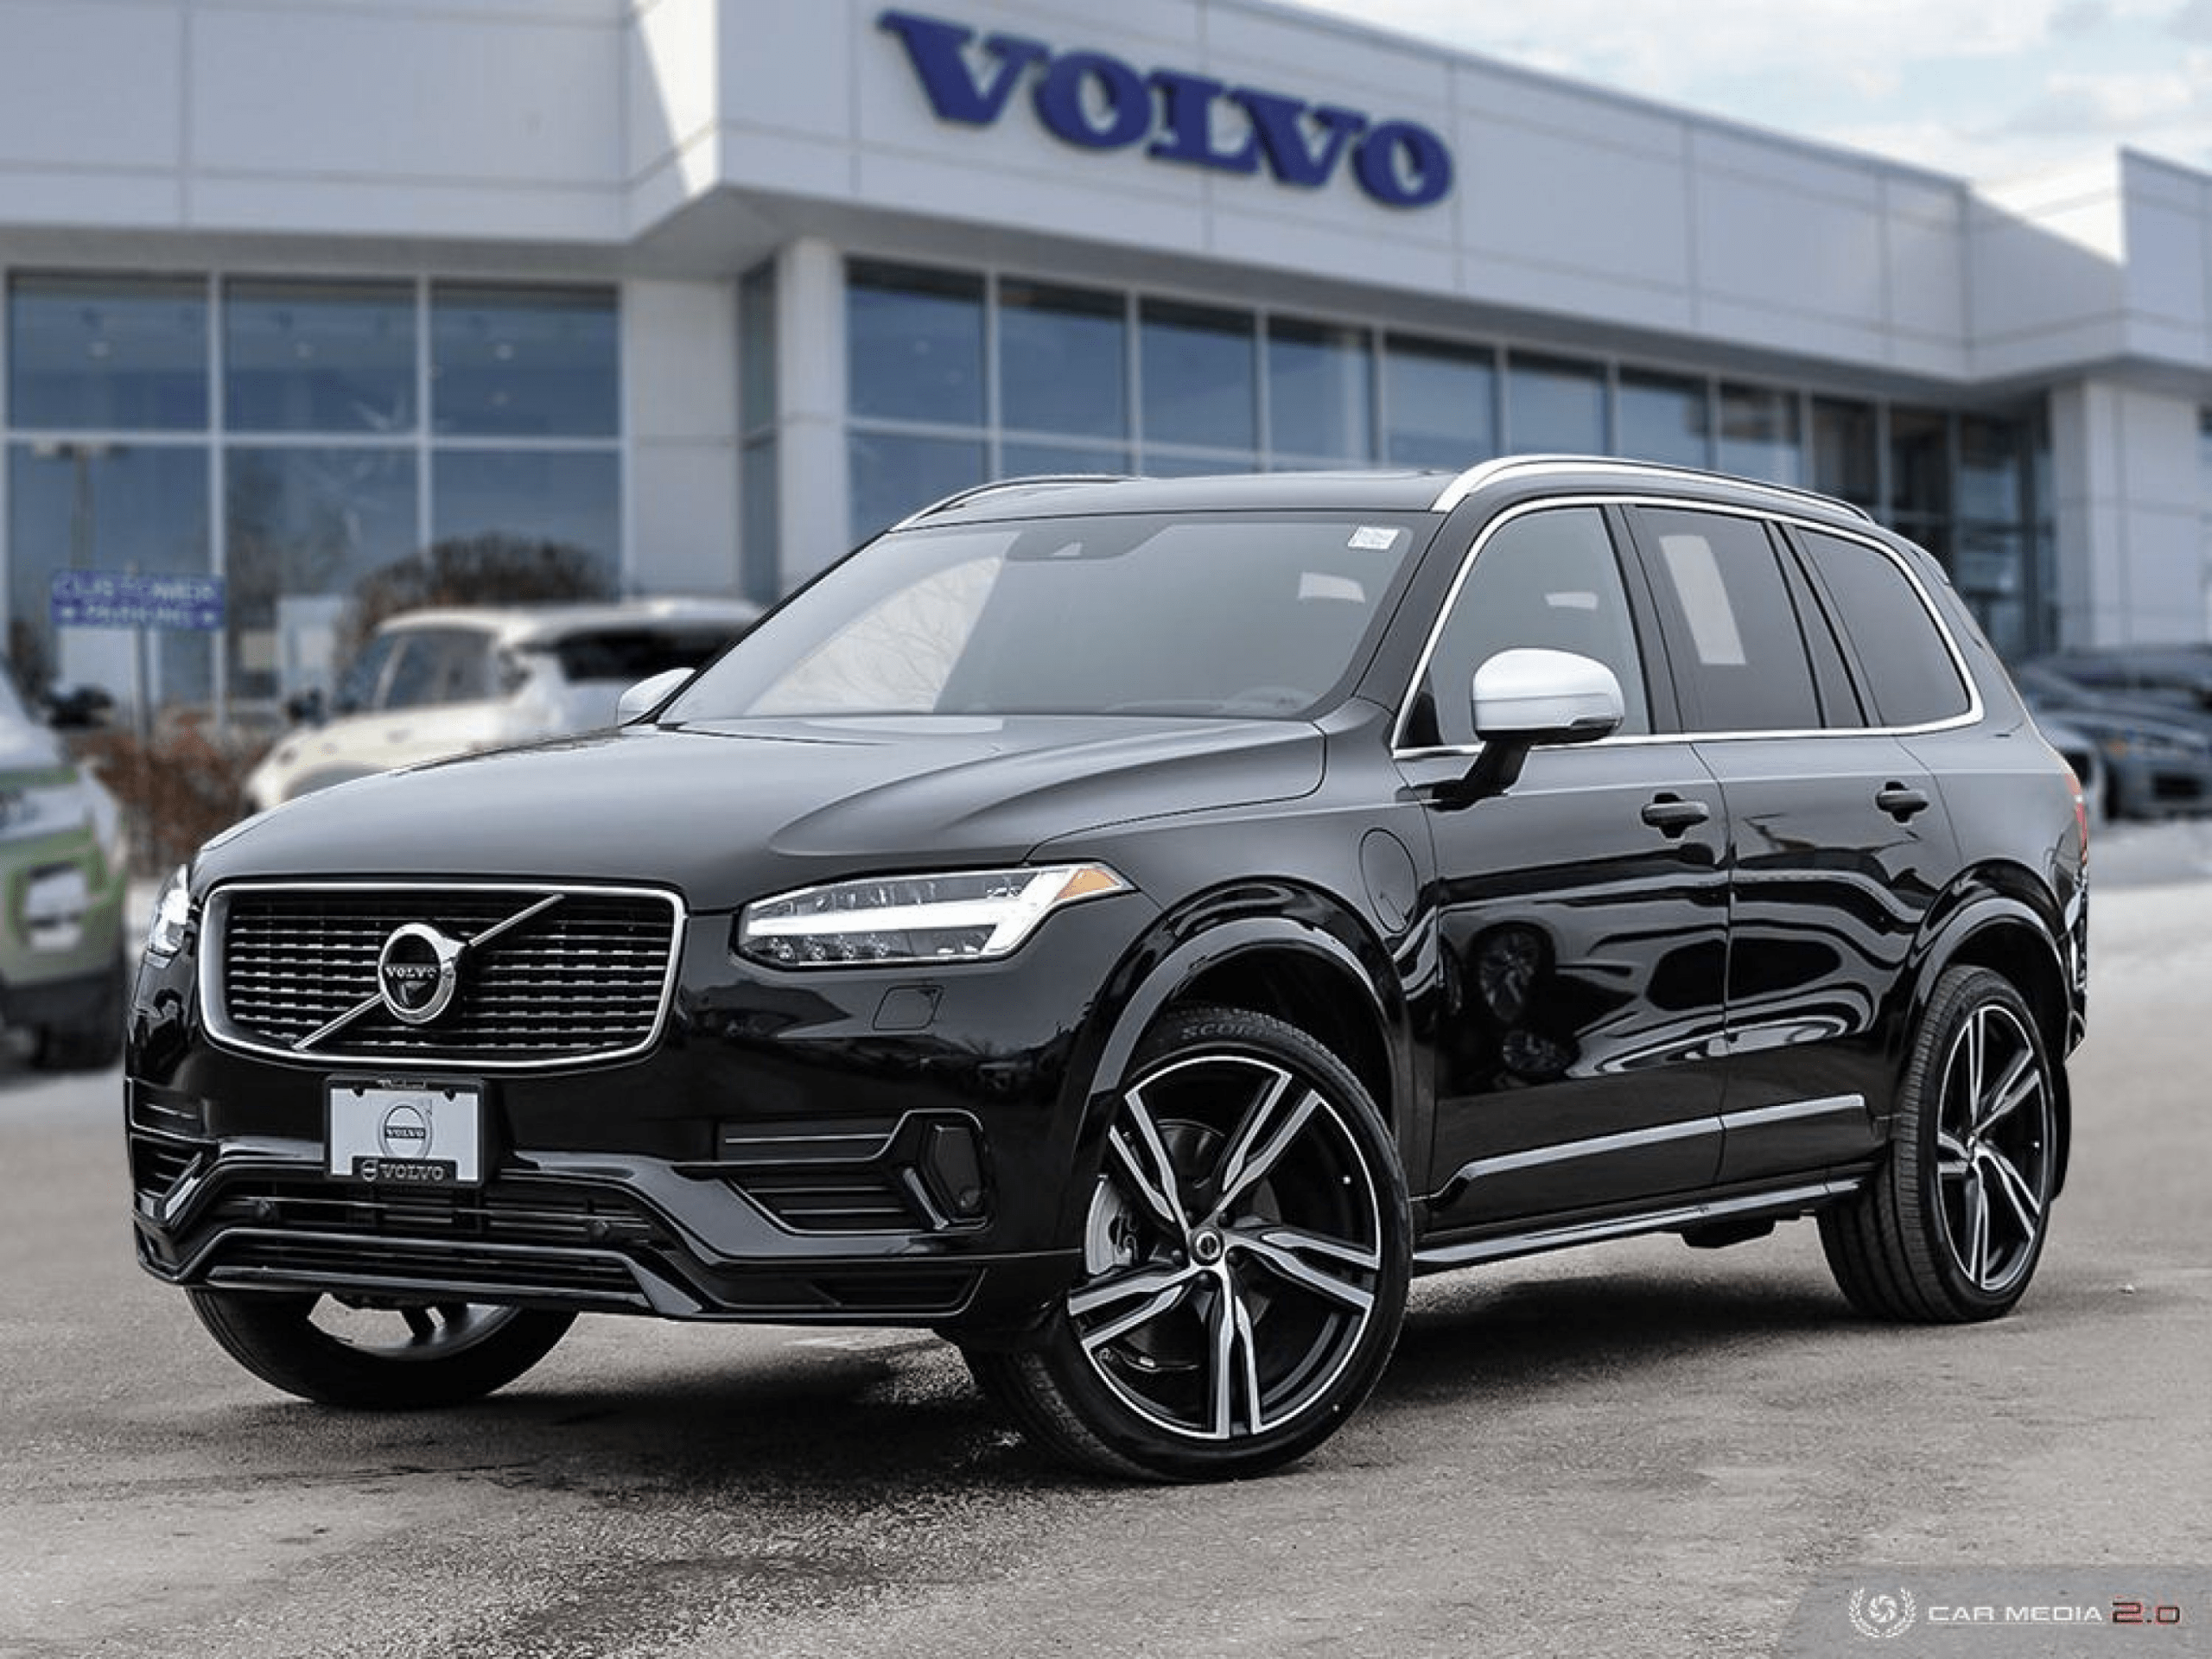 2020 Volvo Xc90 Exterior and Interior in 2020 Volvo xc90